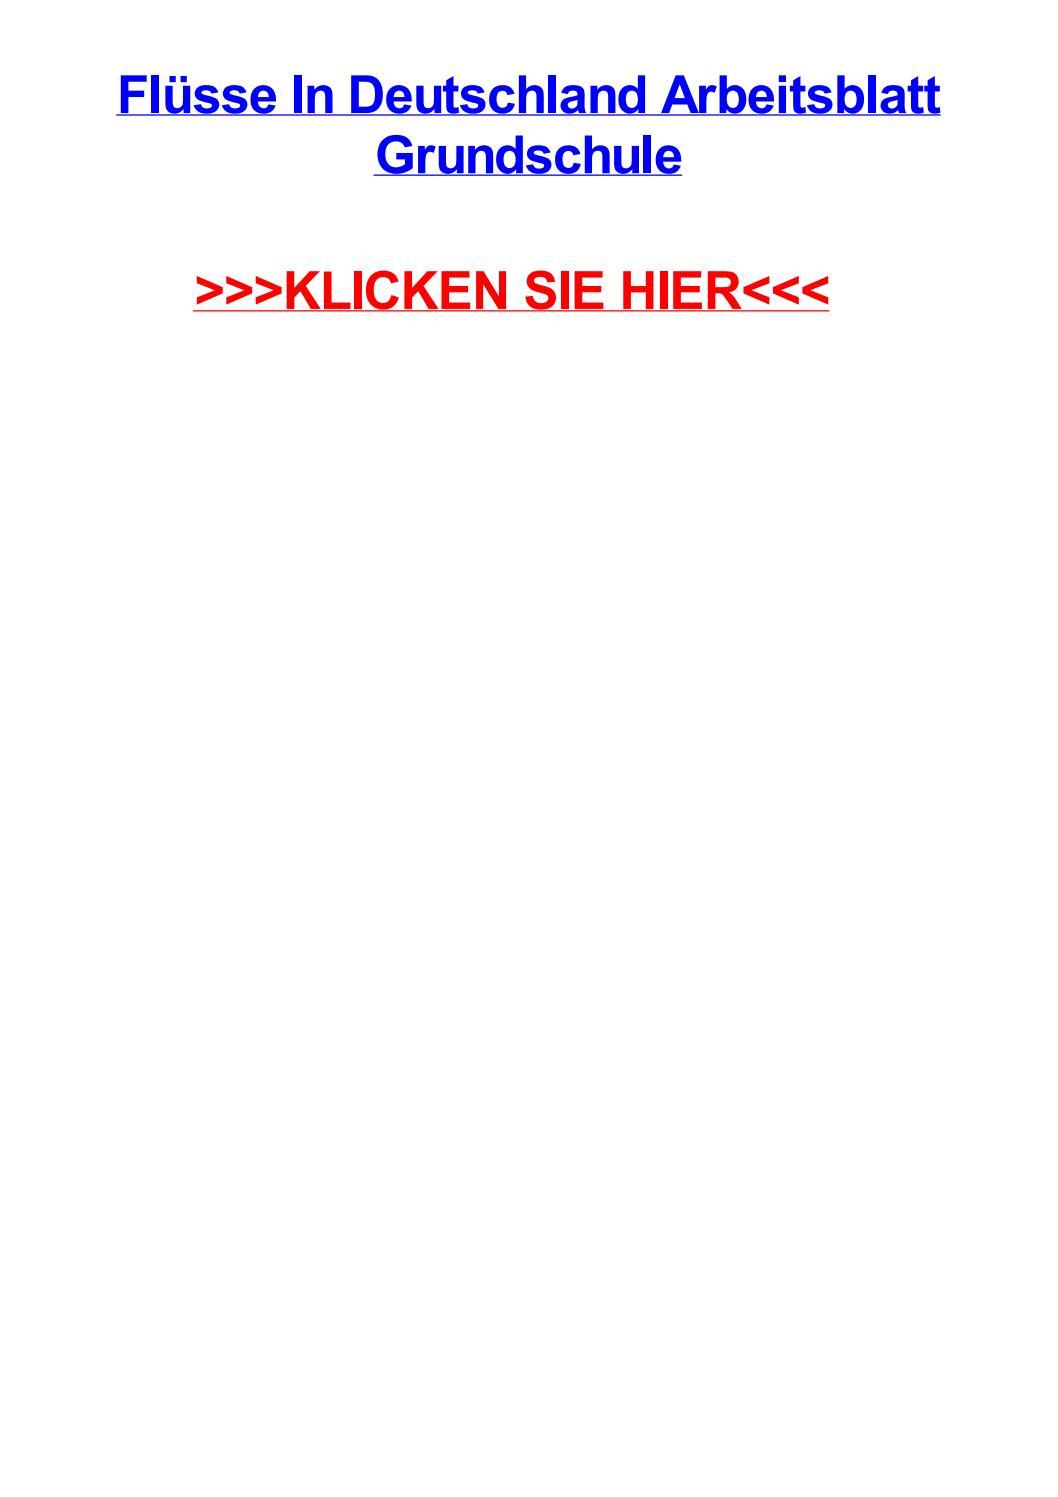 Fljsse in deutschland arbeitsblatt grundschule by amylobg - issuu